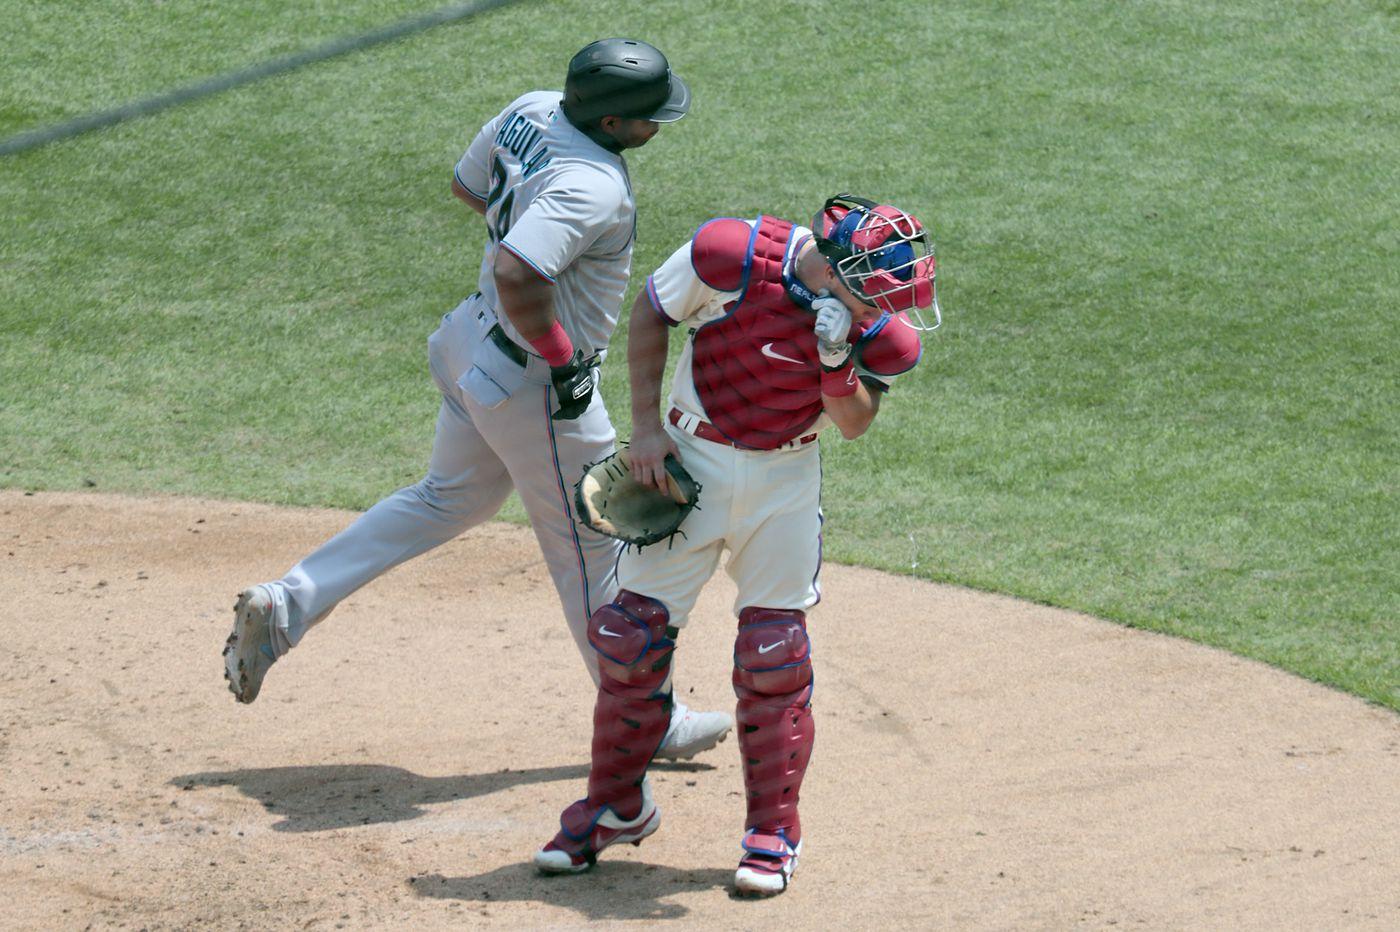 Yankees-Phillies game postponed as Miami Marlins suffer coronavirus outbreak during Citizens Bank Park series